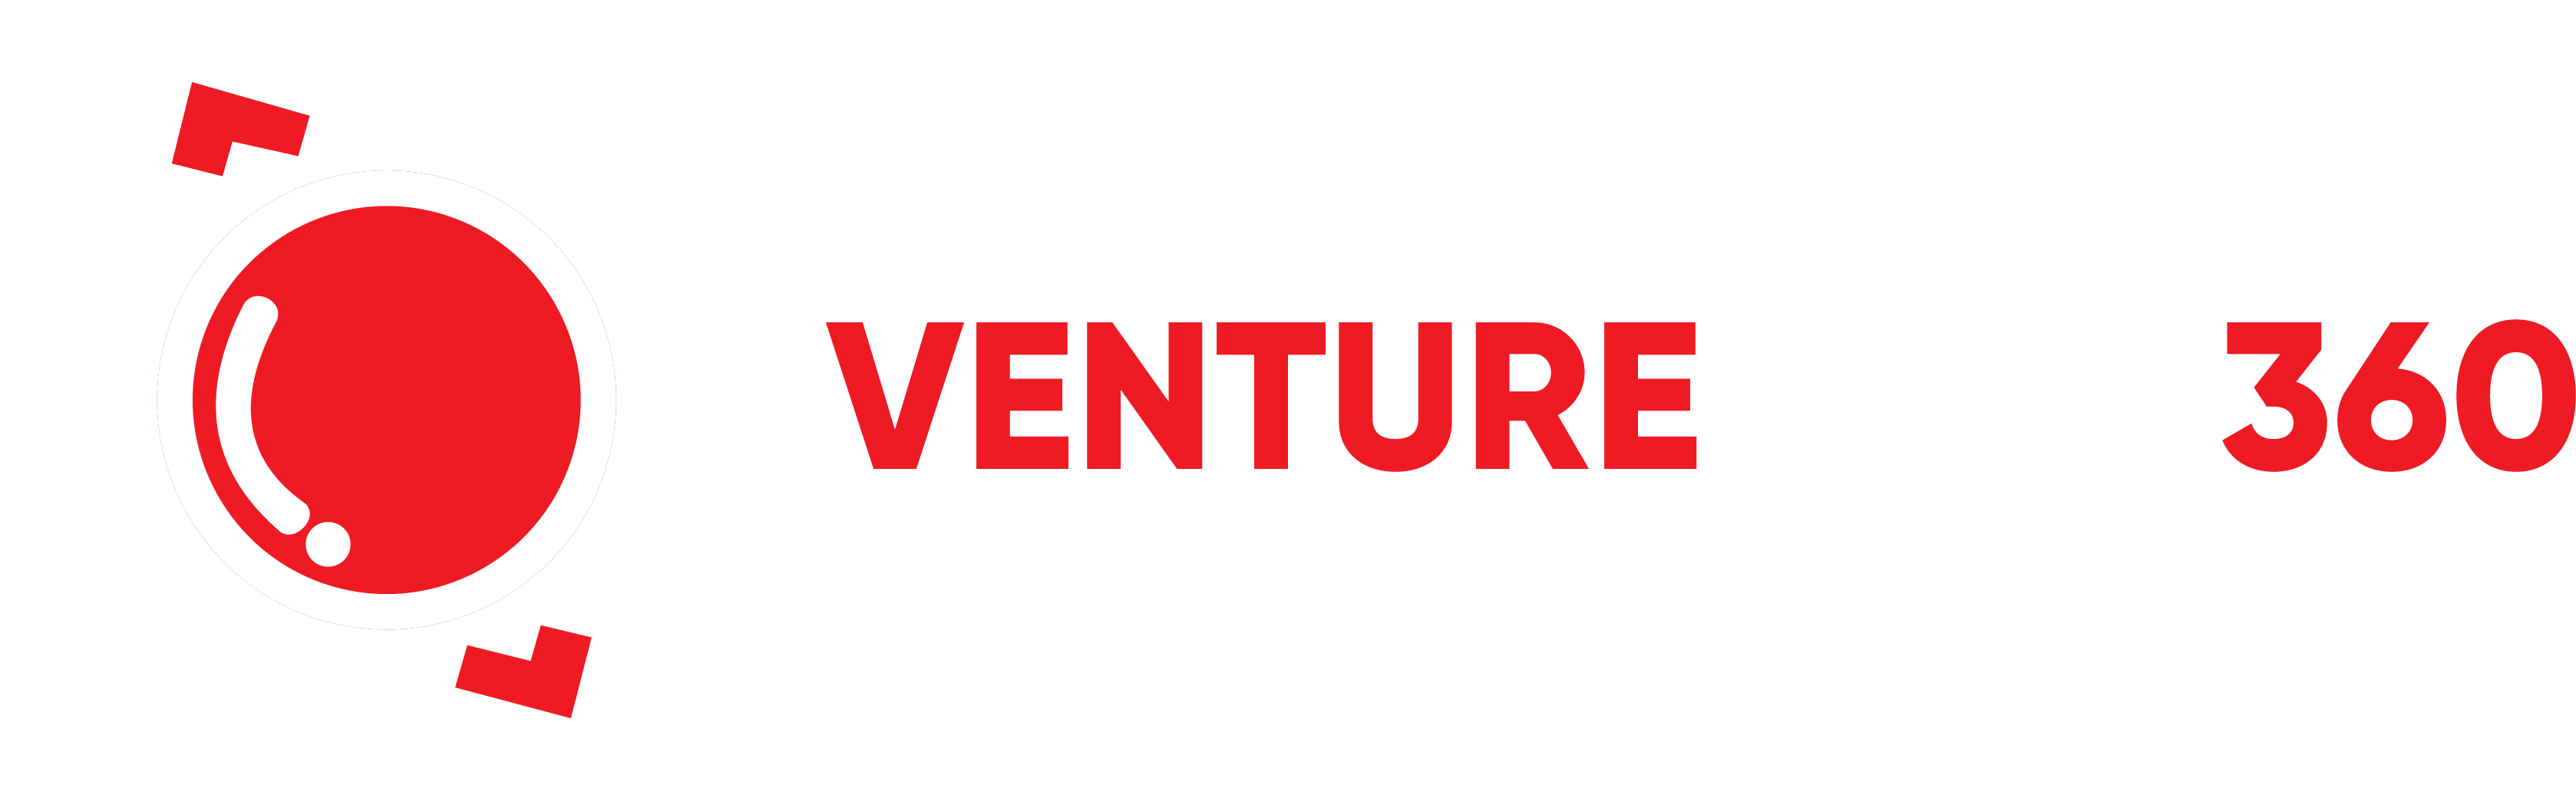 Venture View 360